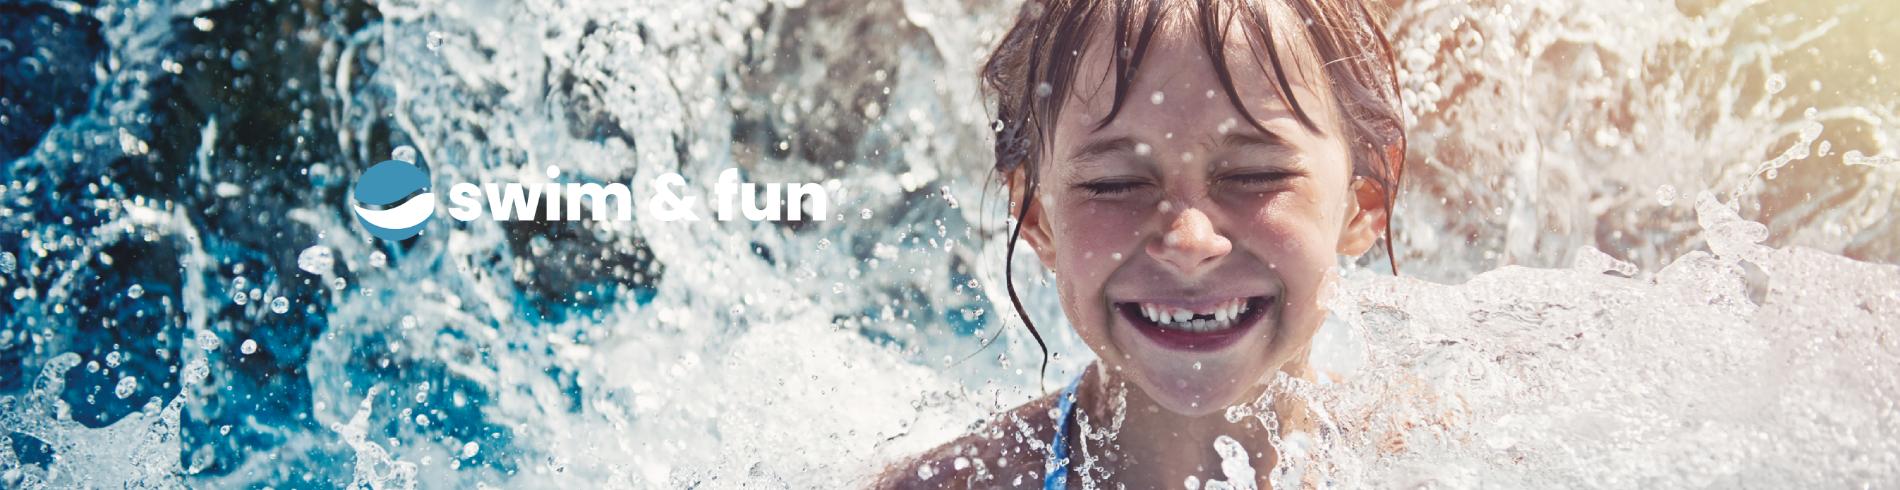 Swim & Fun Scandinavia cover image